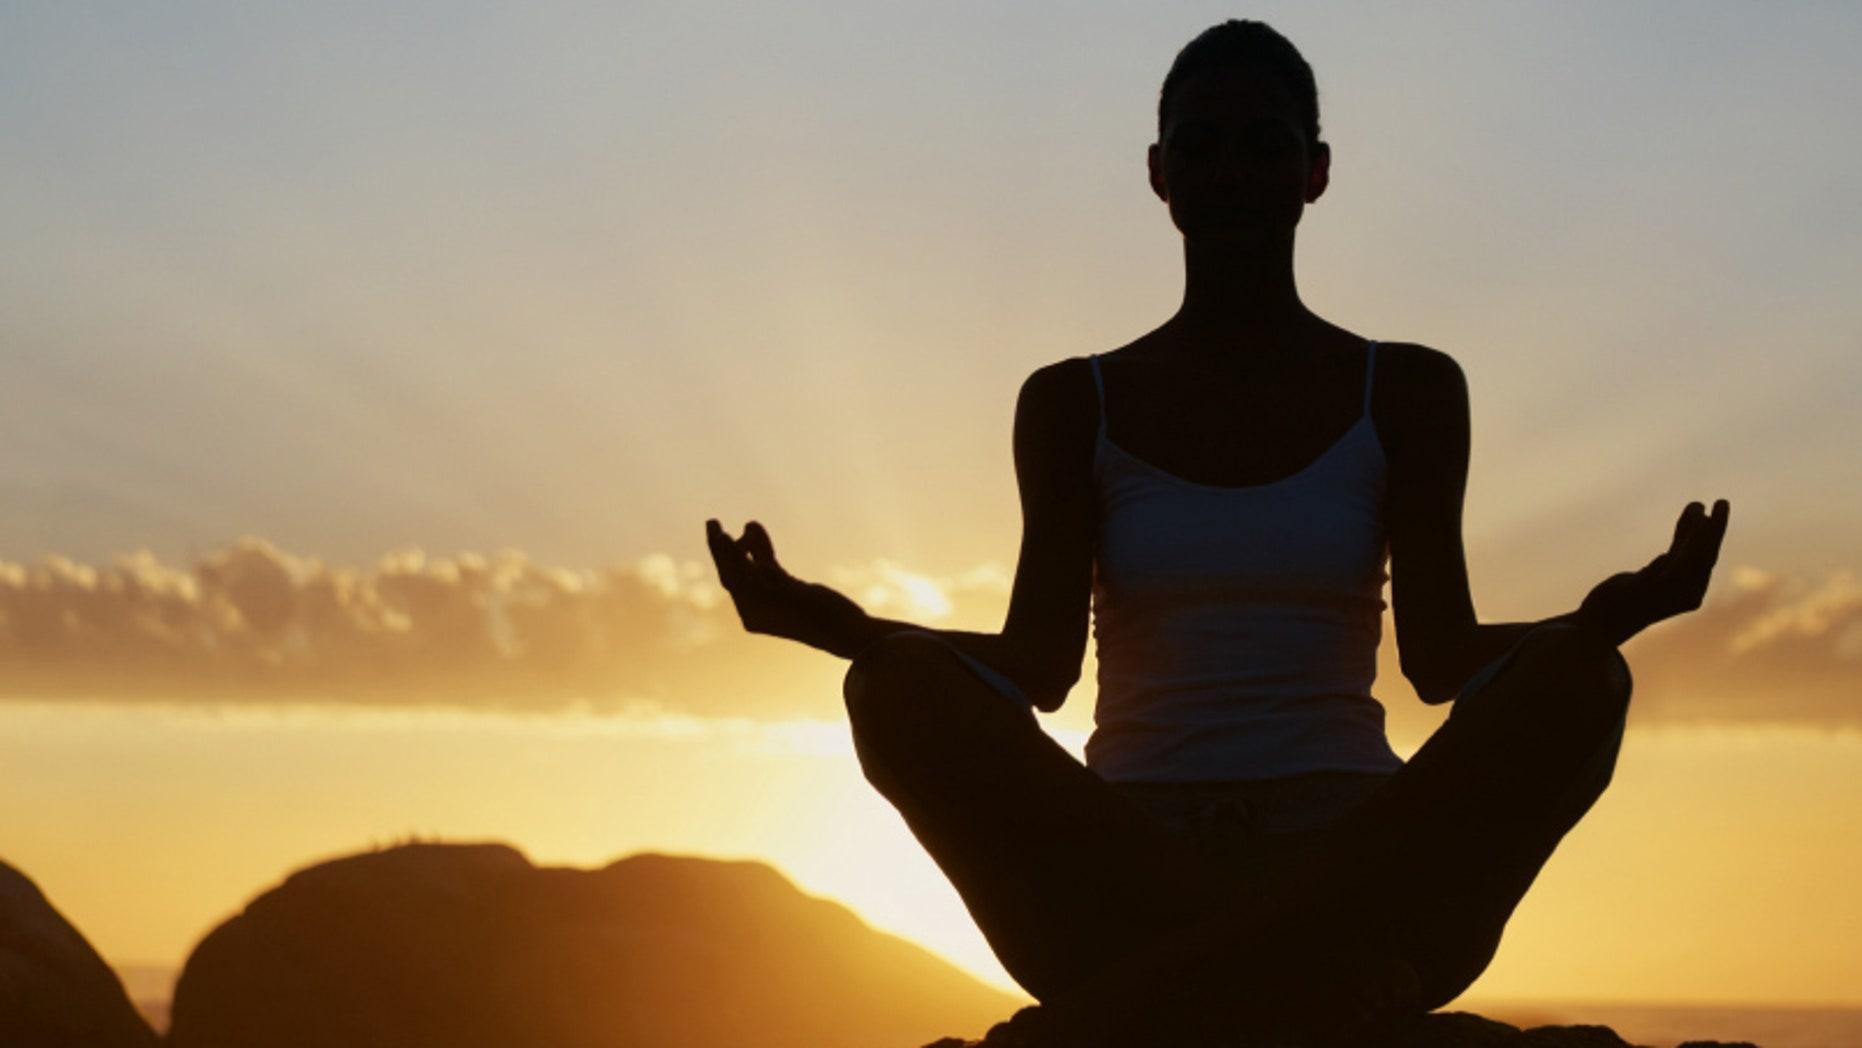 Beautiful silhouette woman sitting in lotus pose at sunset